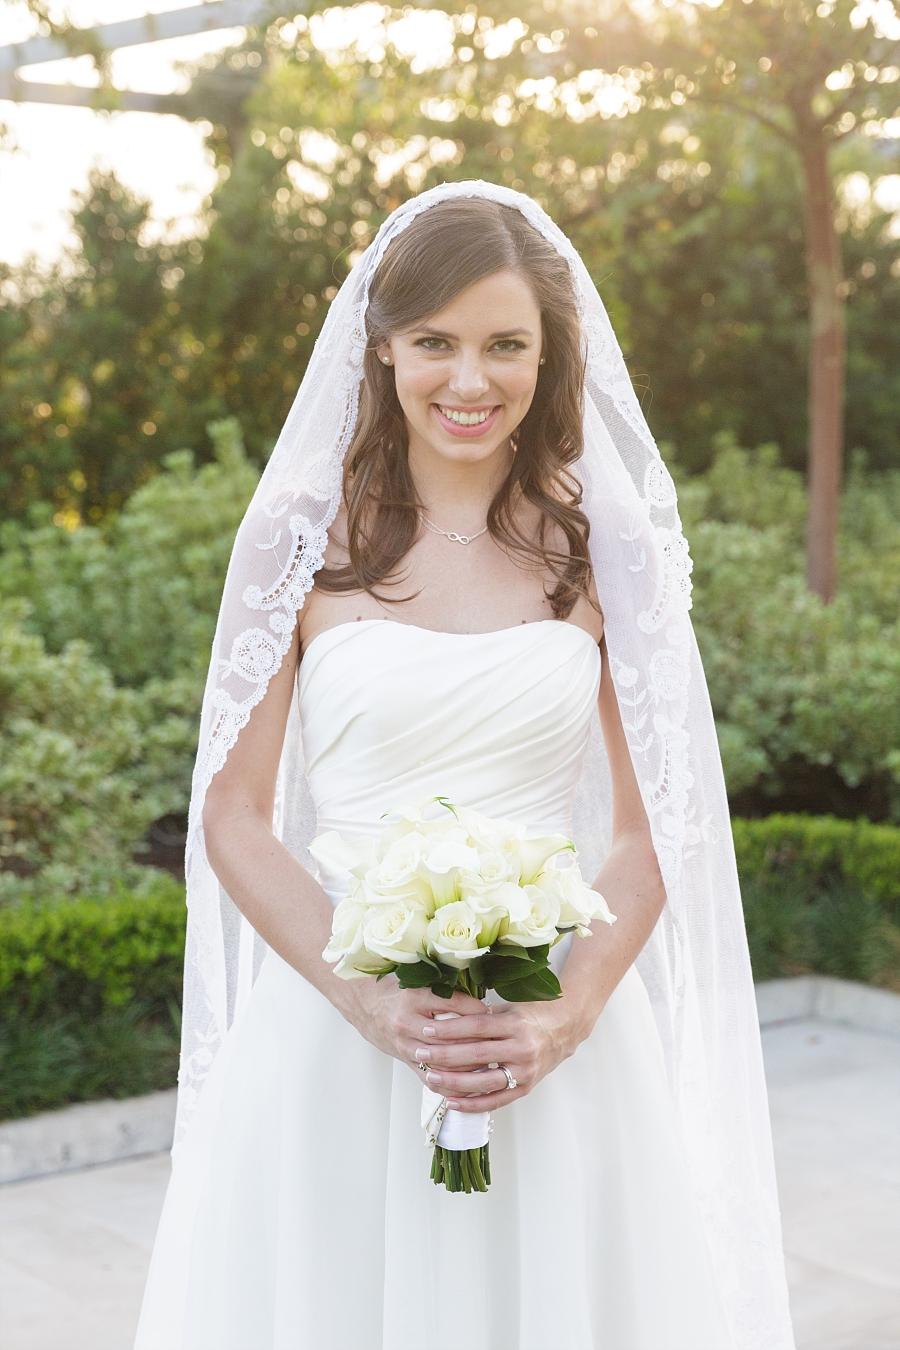 Stacy-Anderson-Photography-McGovern-Centennial-Gardens-Houston-Wedding-Photographer_0052.jpg